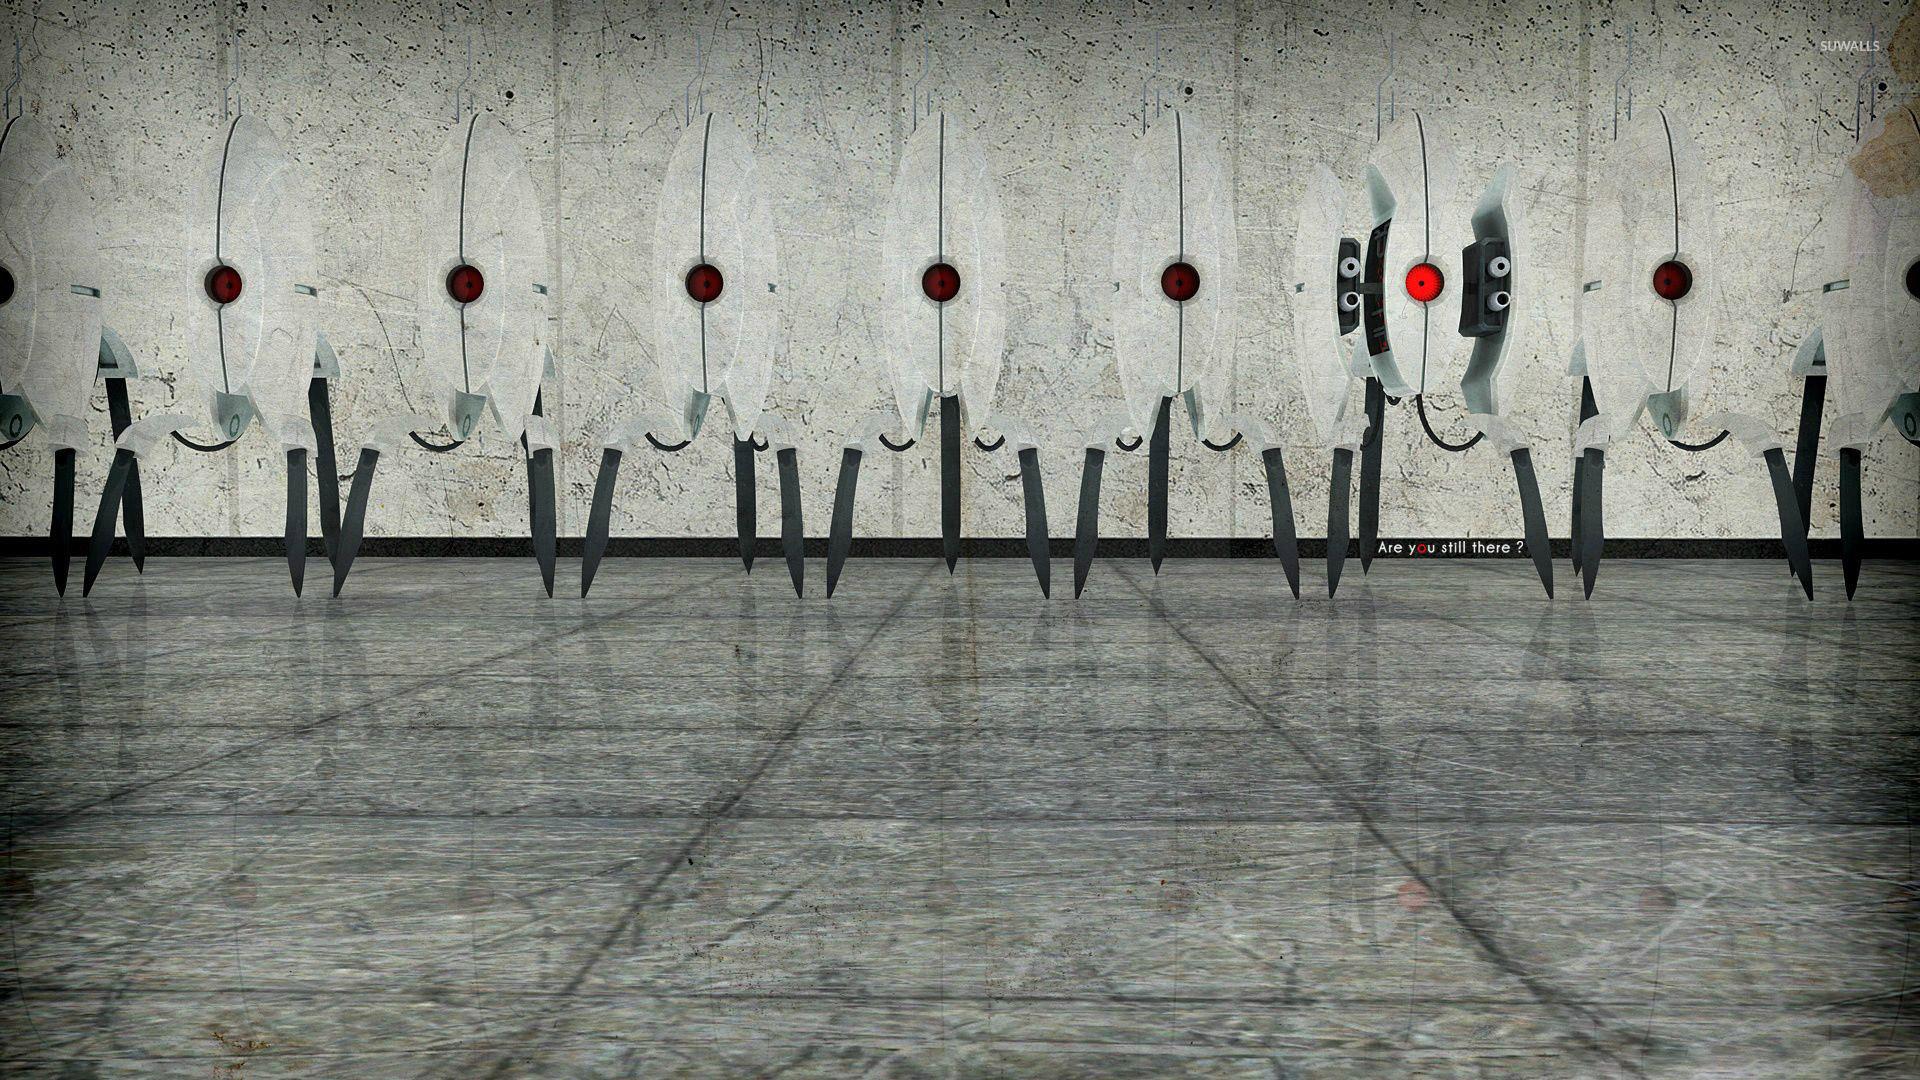 Are you still there – Portal 2 wallpaper jpg